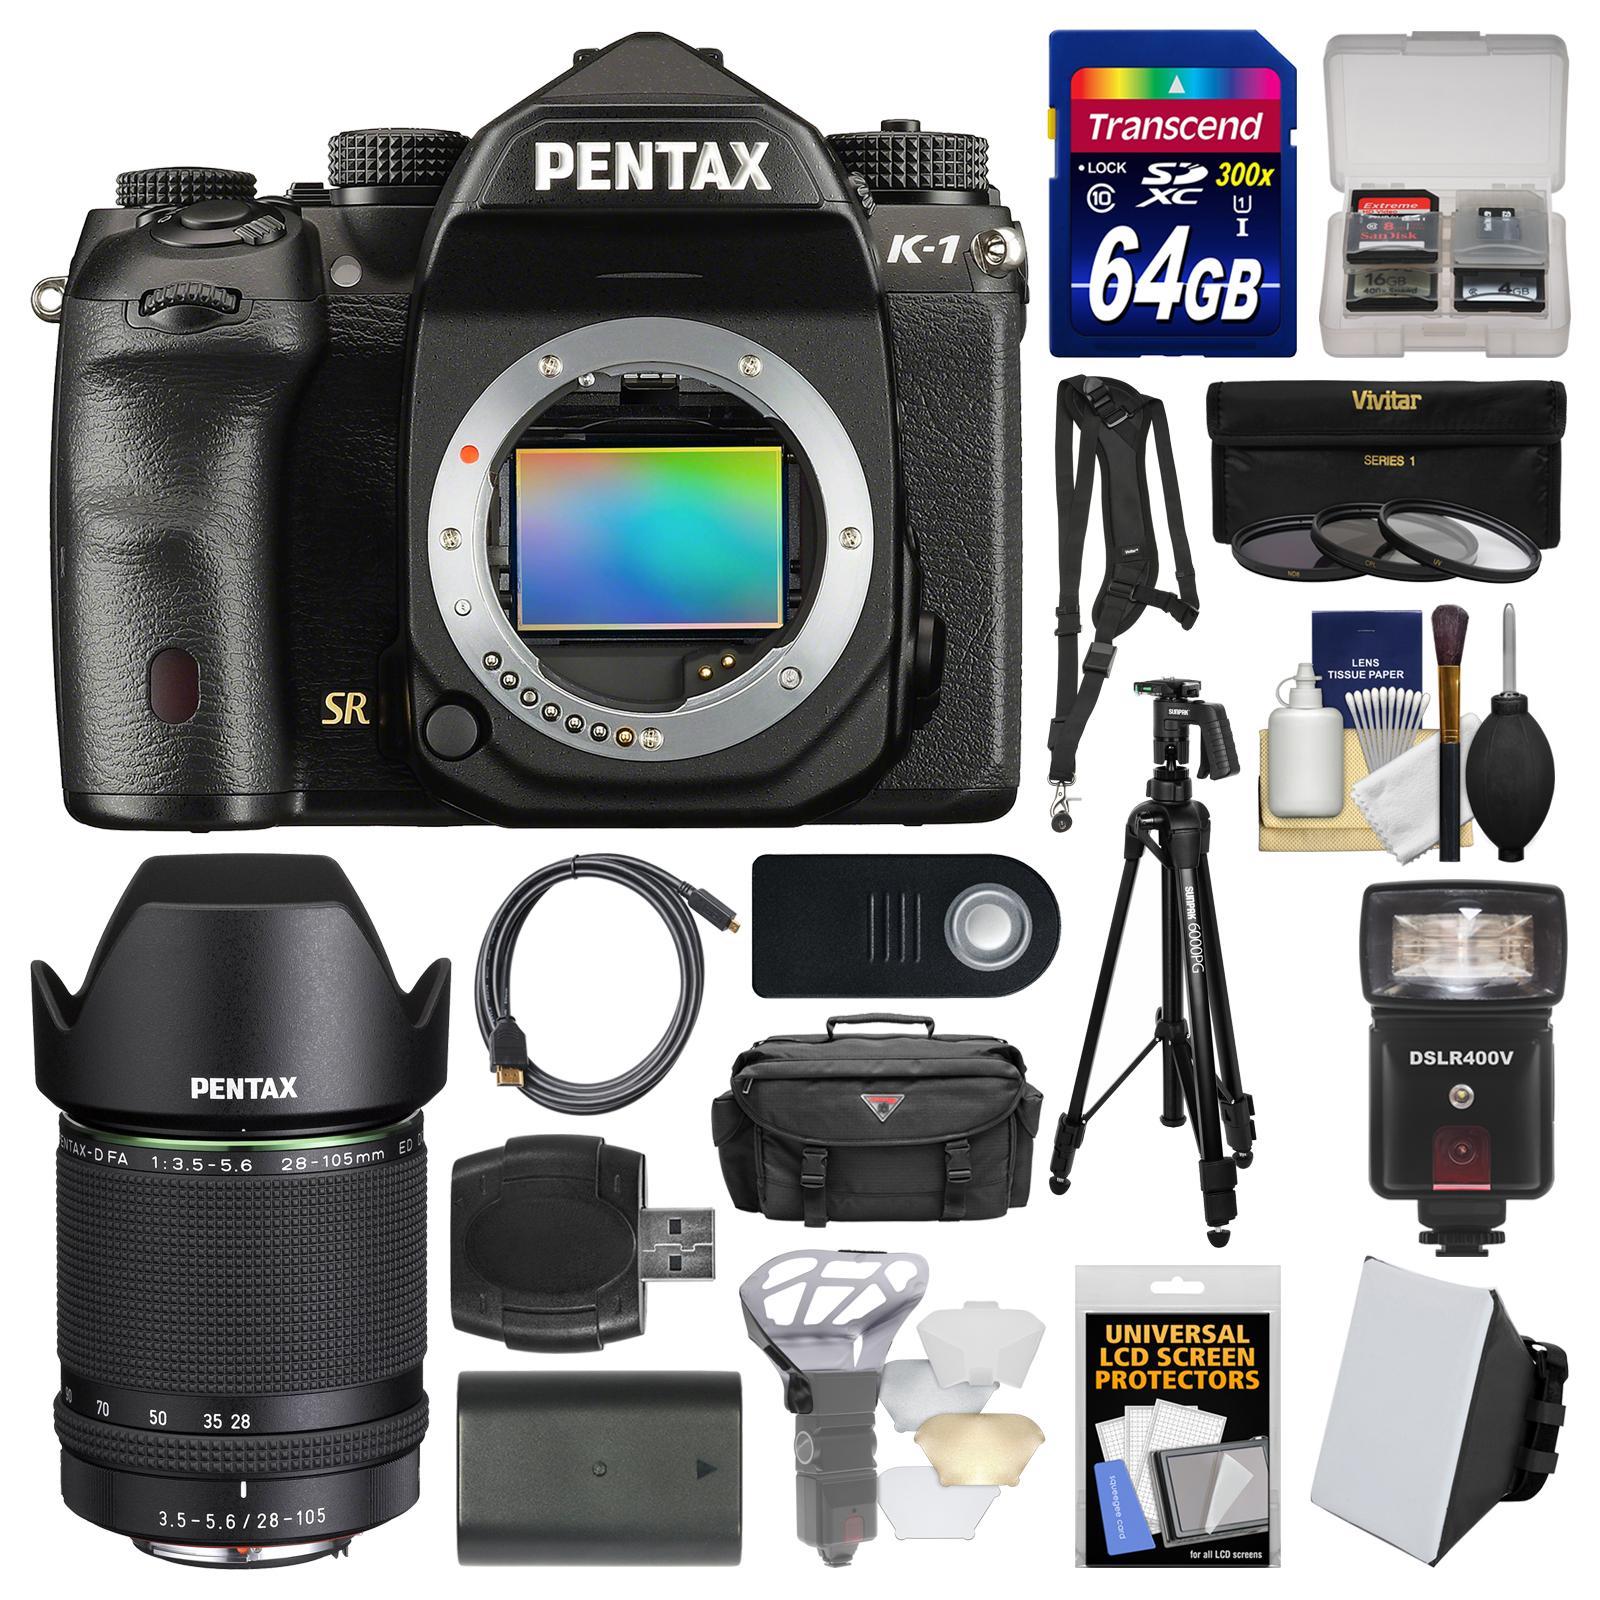 Pentax K-1 Full Frame Wi-Fi Digital SLR Camera Body with FA 28-105mm WR Lens + 64GB Card + Case + Flash + Soft Box + Diffuser Kit